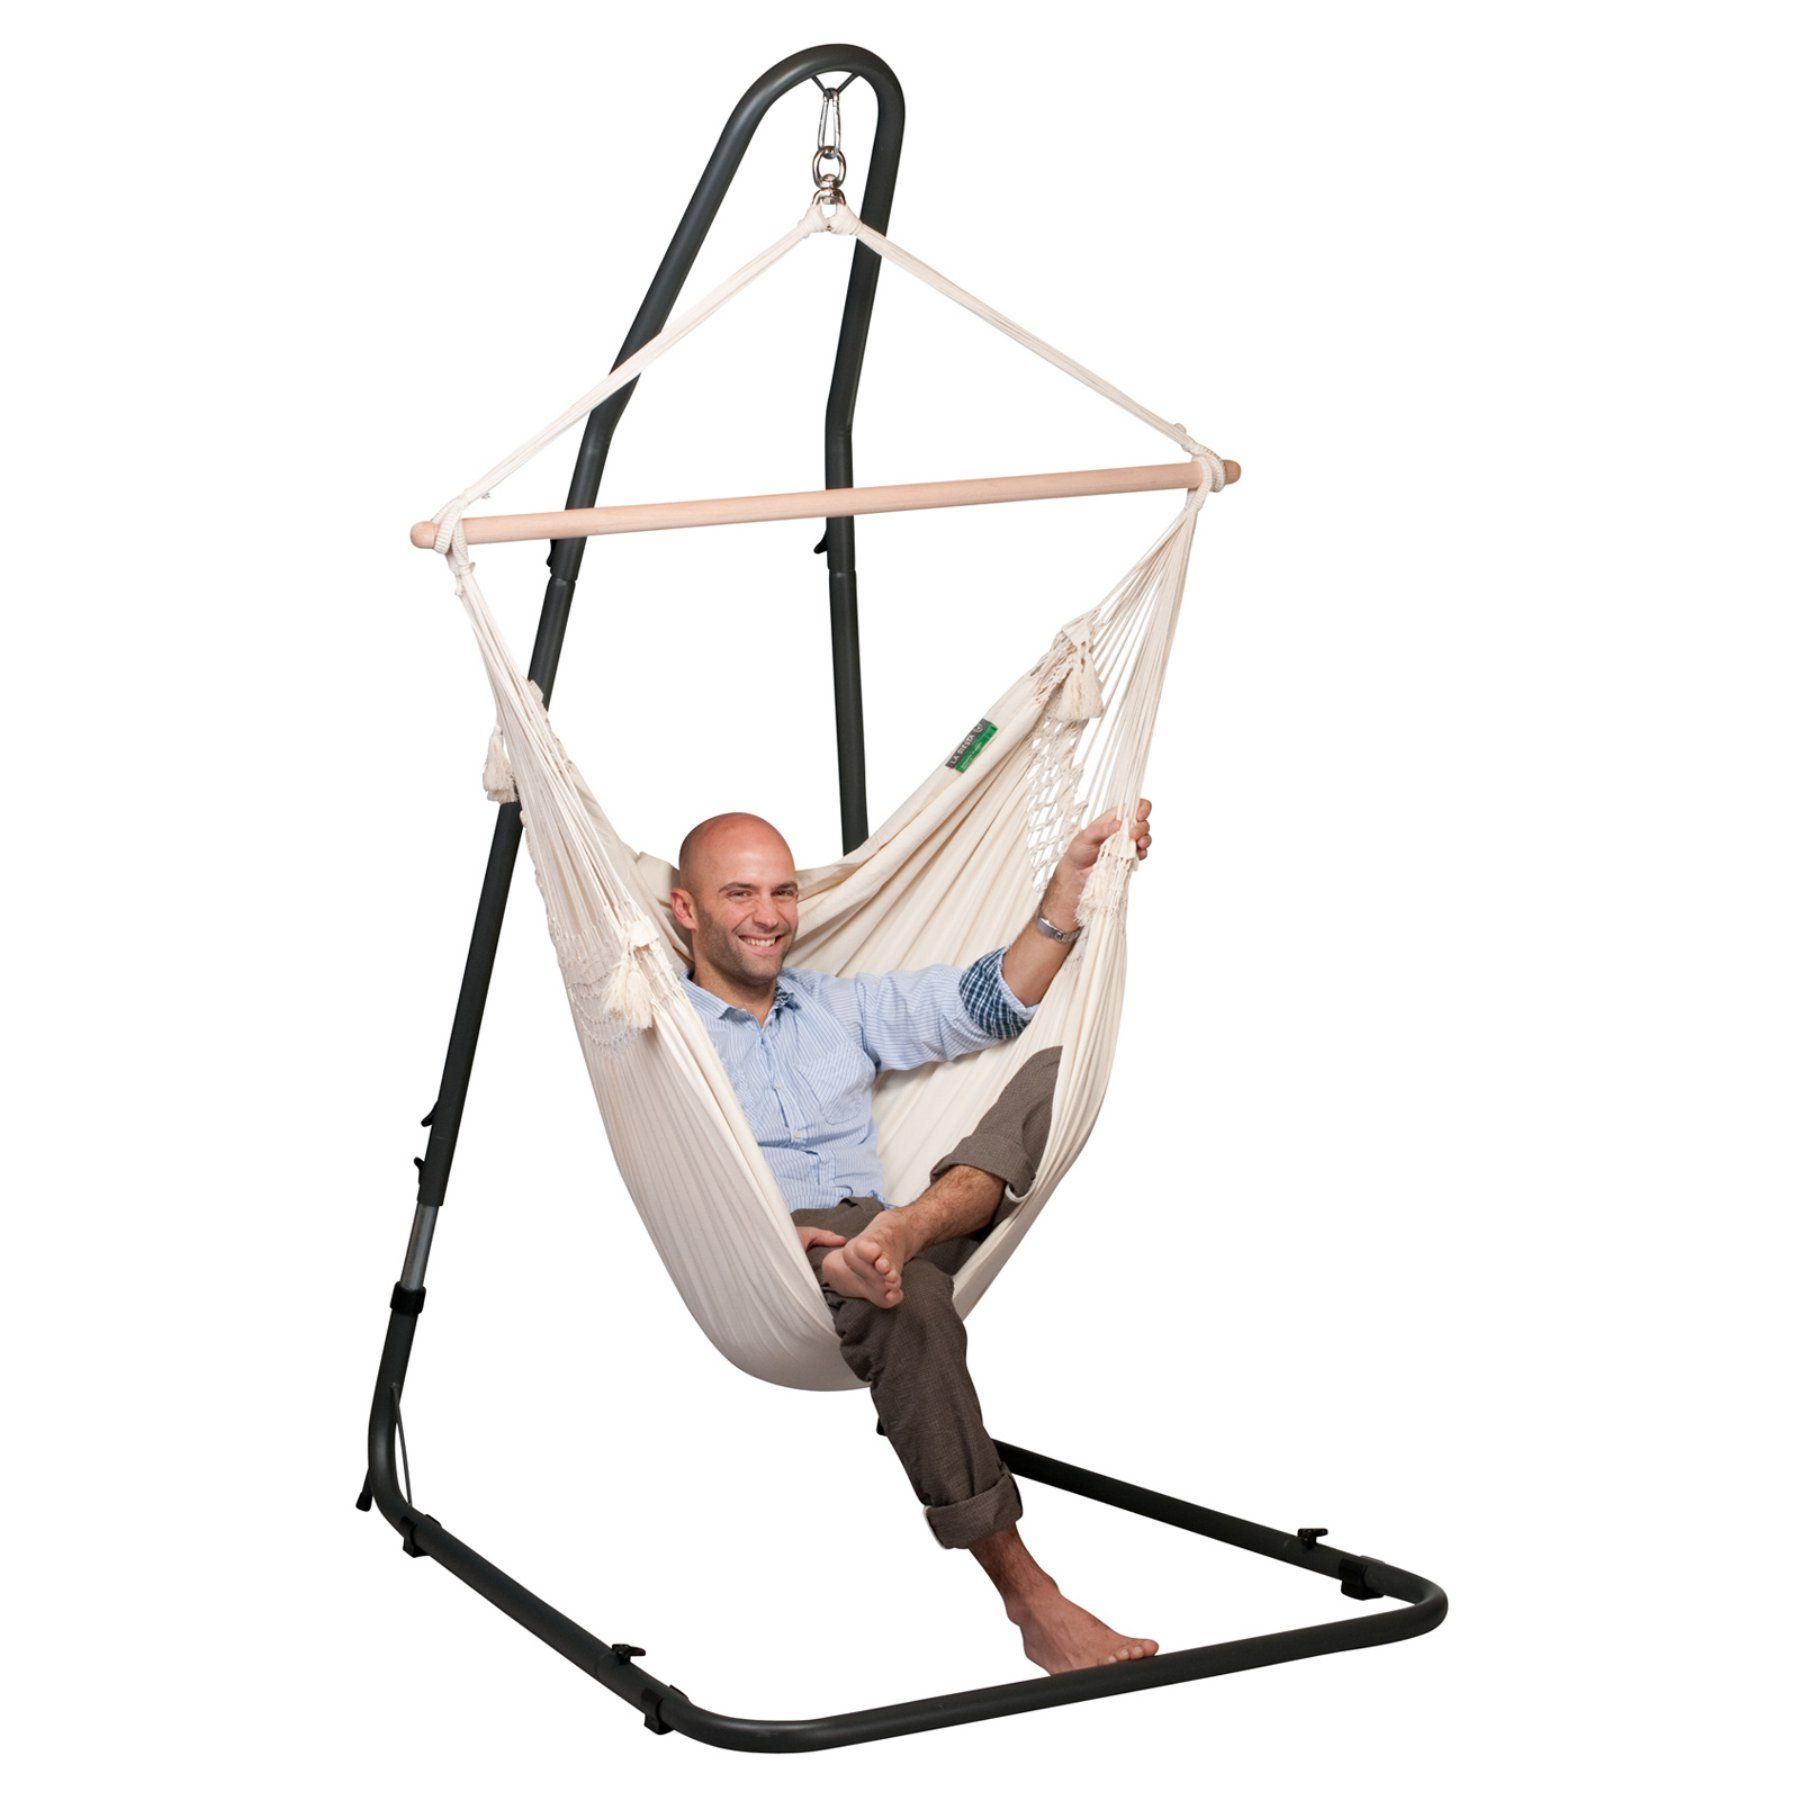 hammock chair stand adjustable lawn chairs on sale la siesta mediterraneo anthracite mea12 9